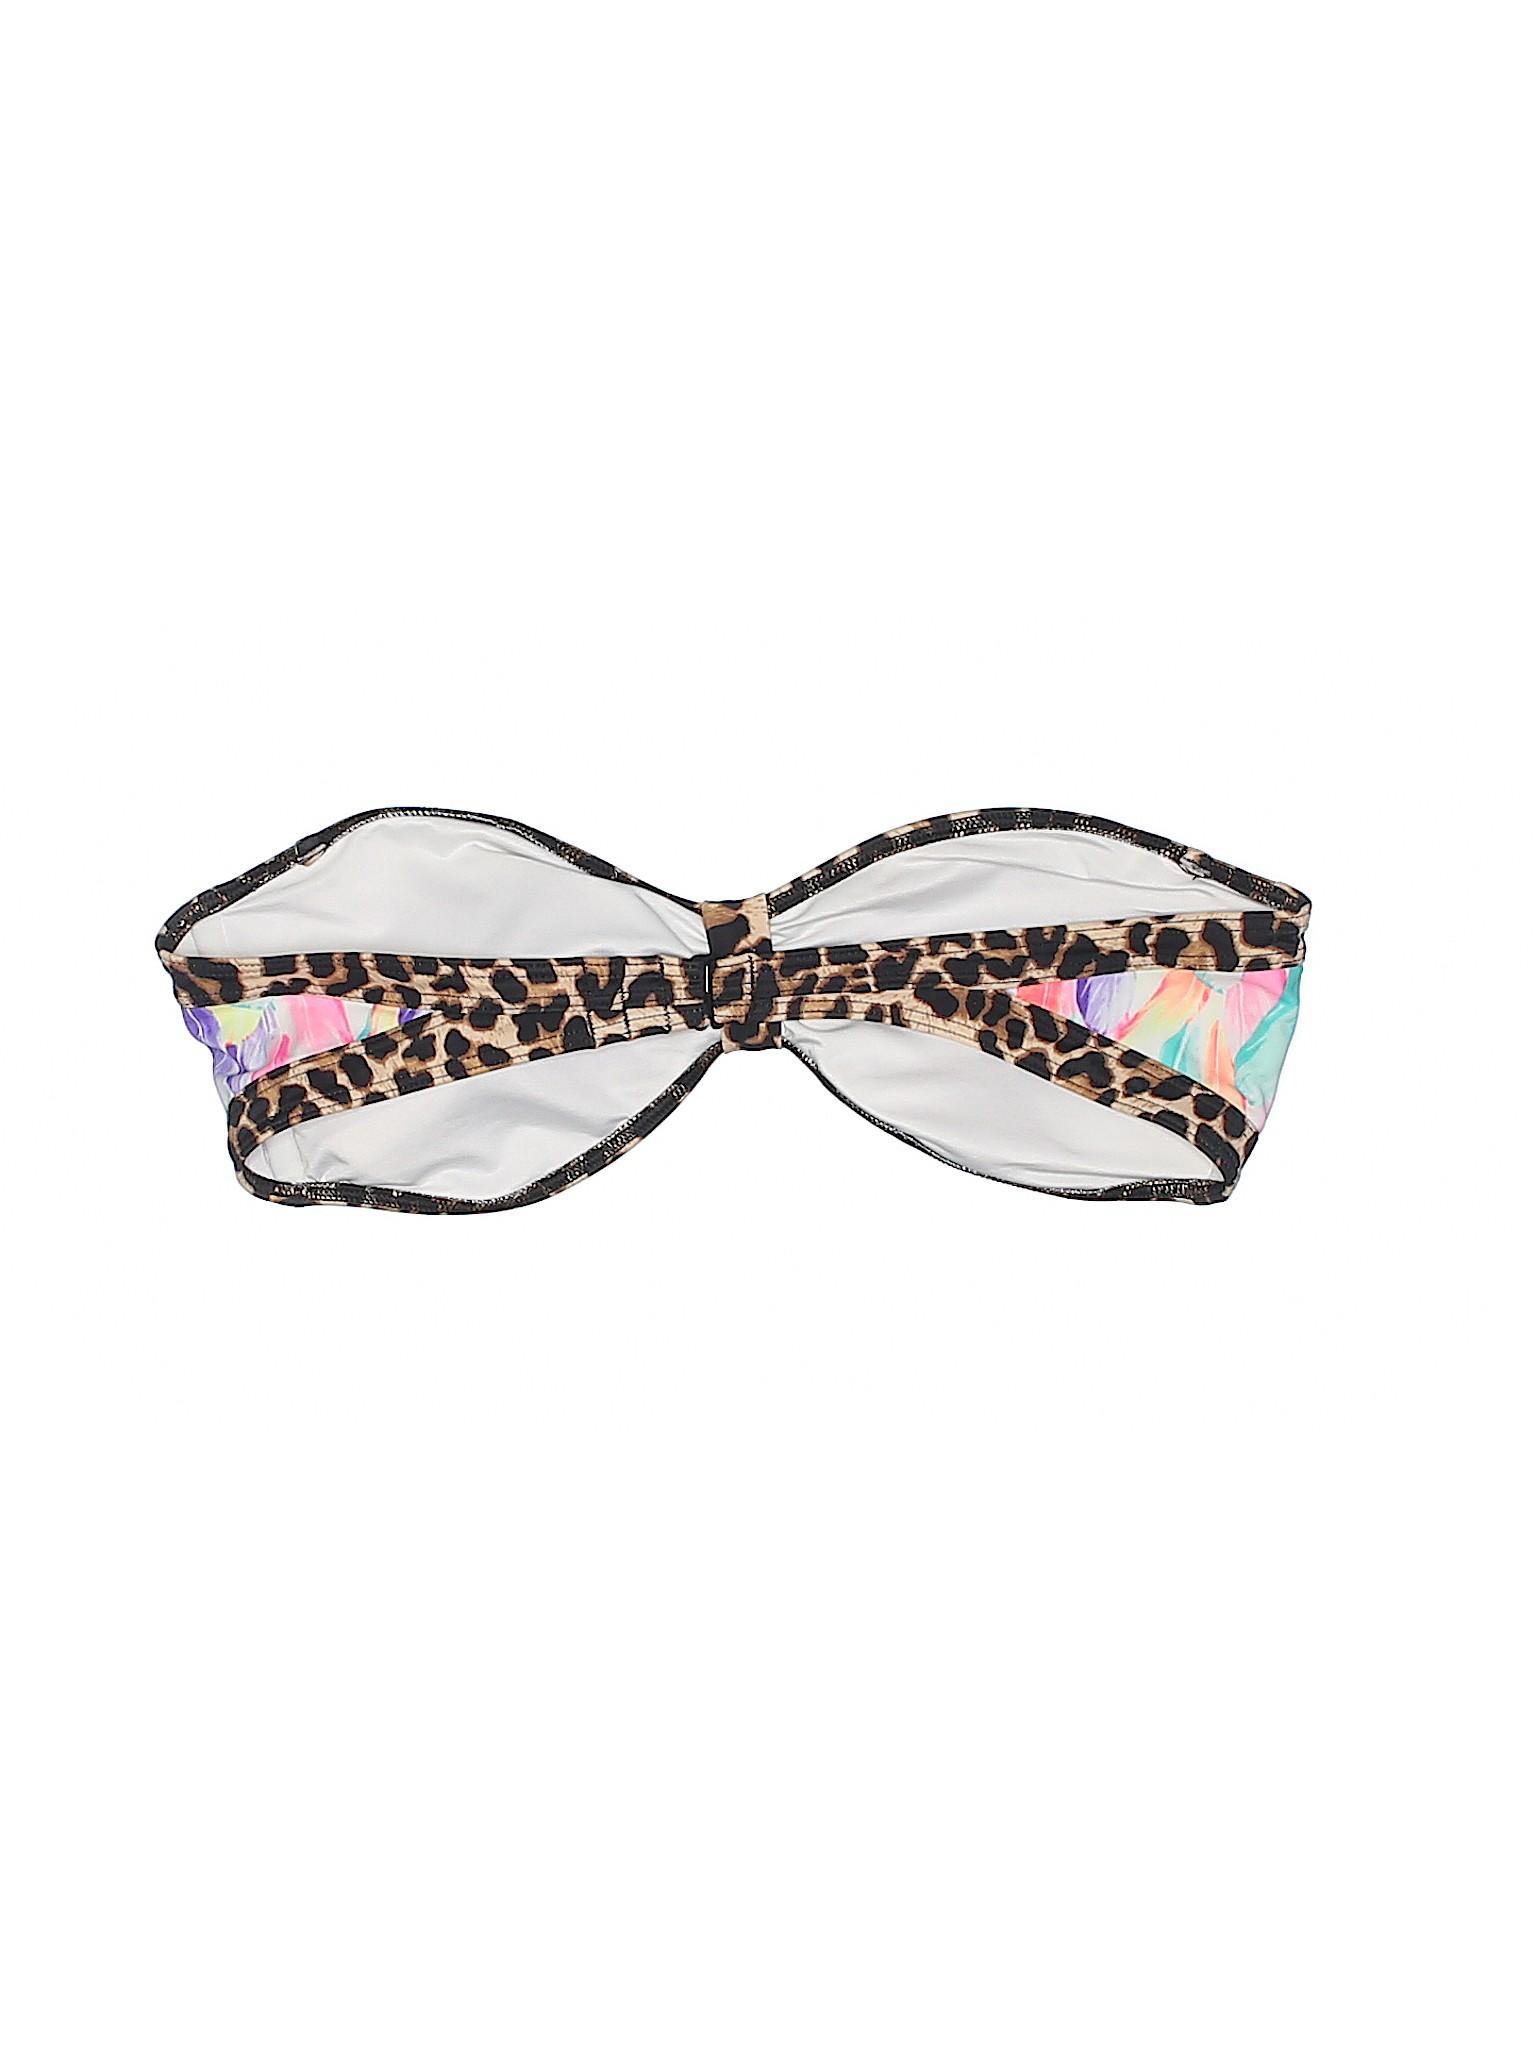 Boutique Secret Swimsuit Pink Victoria's Top aaRxv